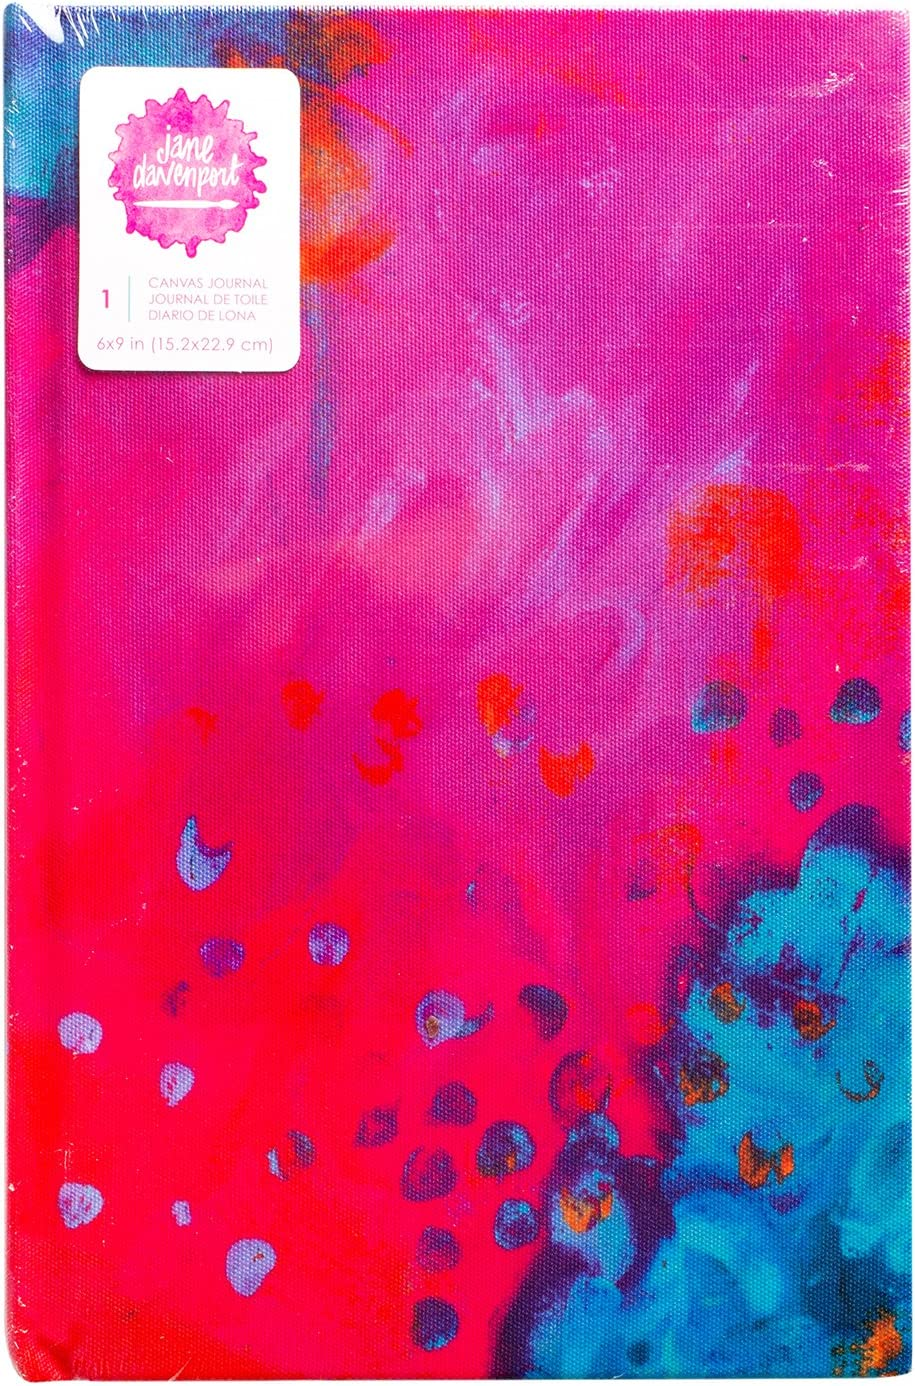 Jane Davenport Toile Journal de 22,9/x 15,2/cm